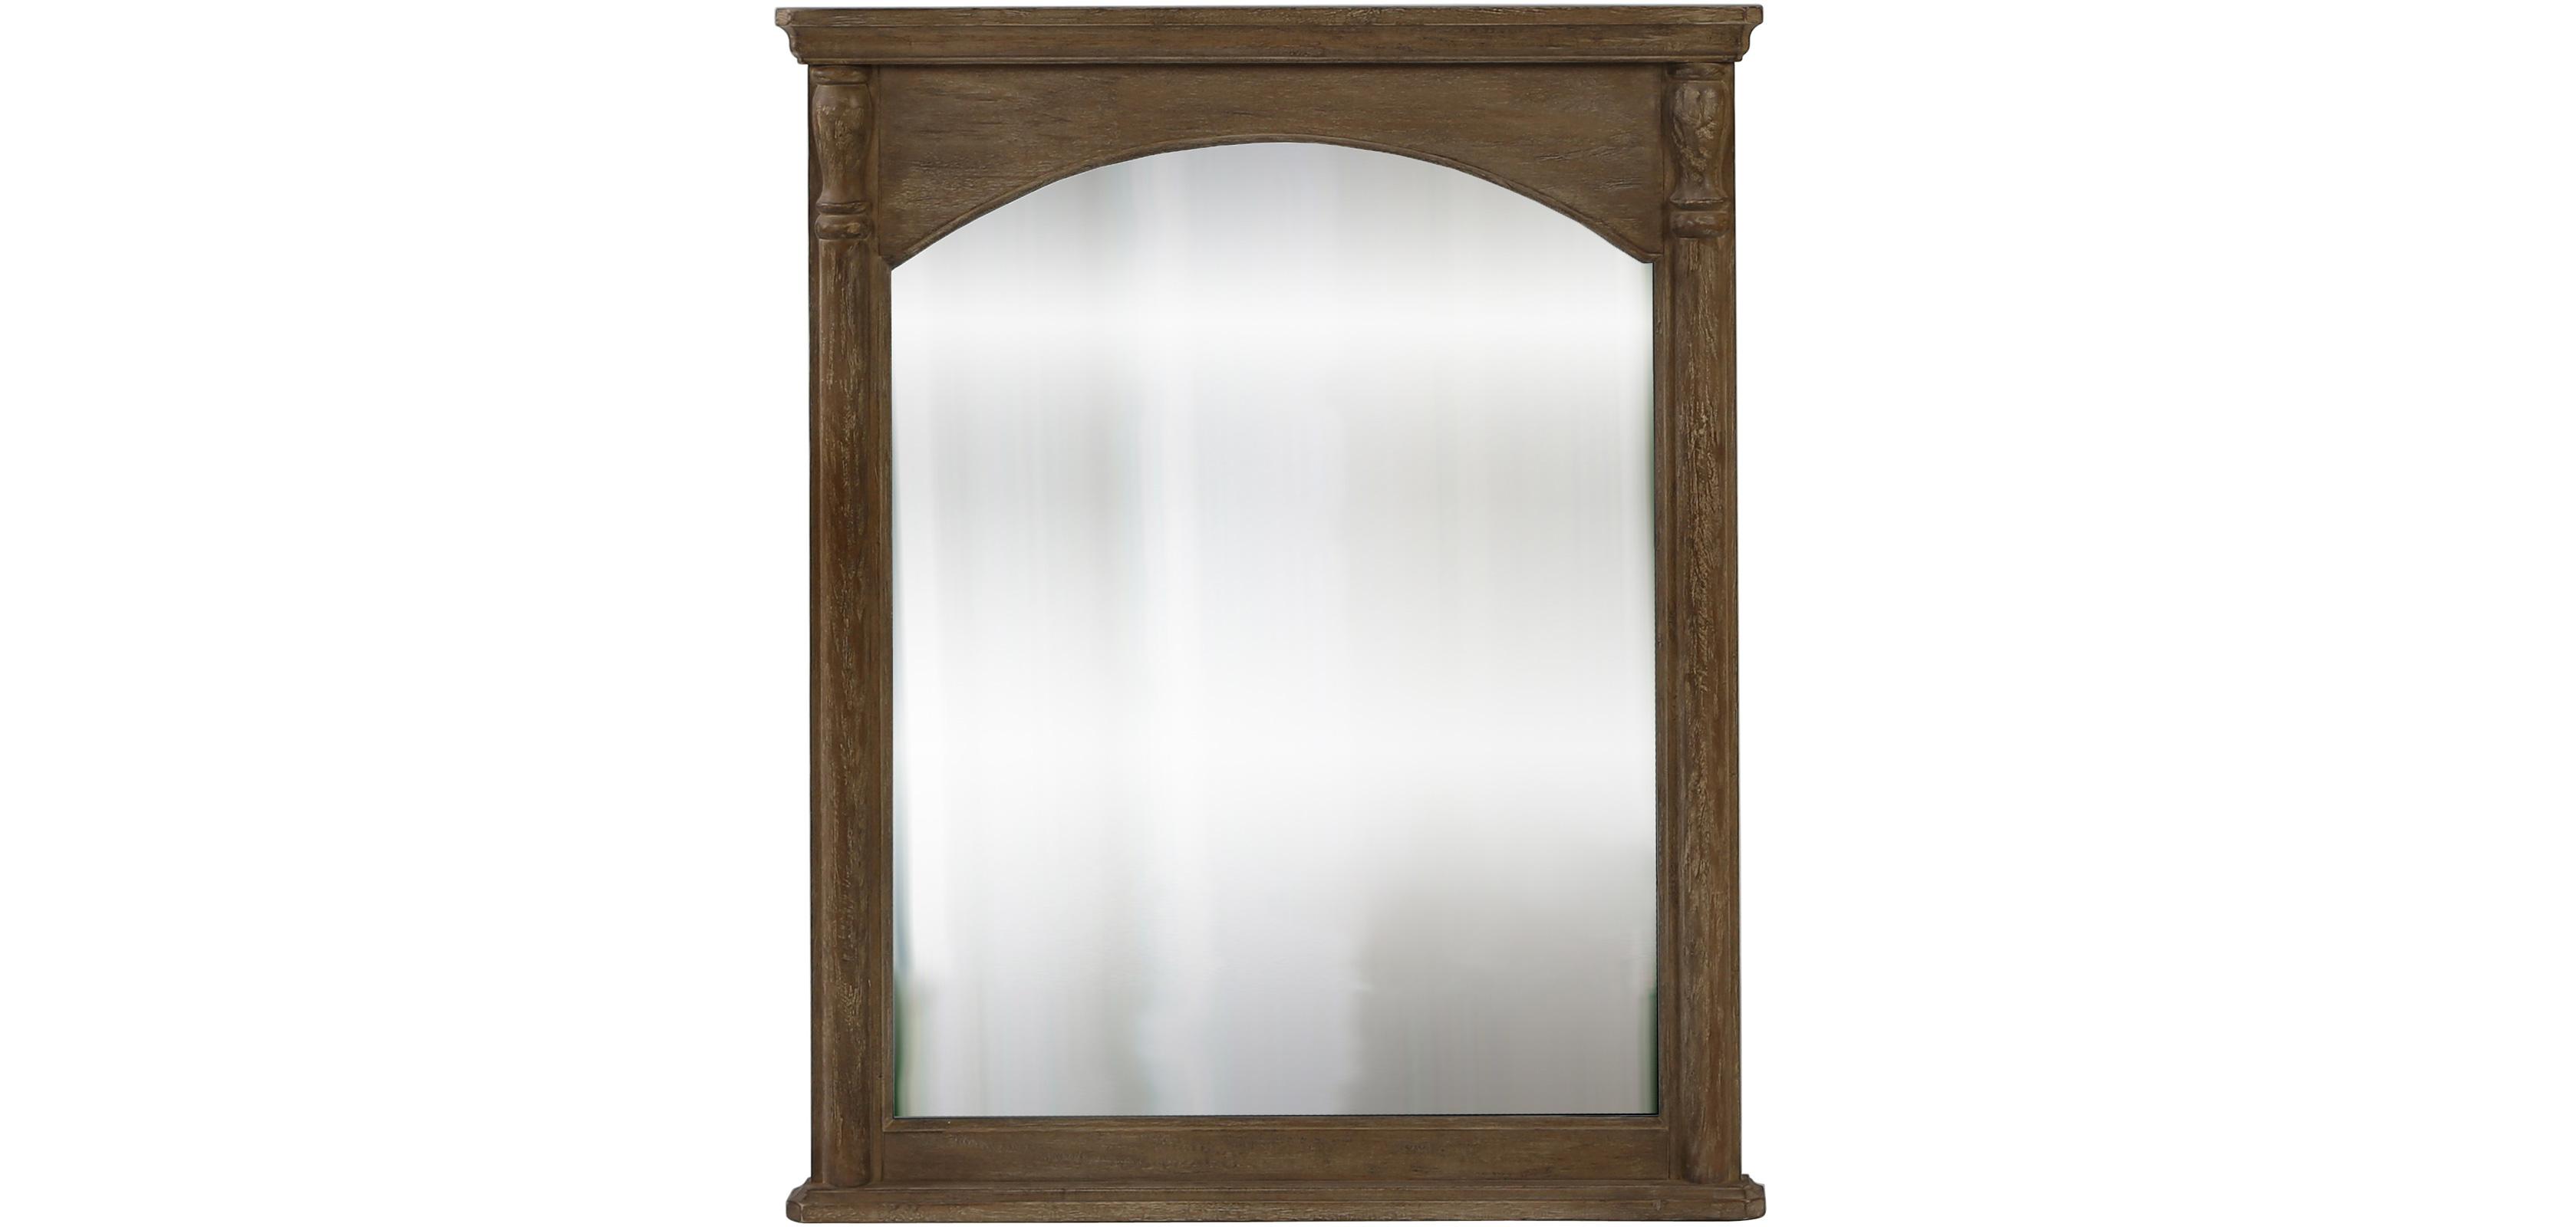 Miroir mural rectangulaire 100 x 80 bois